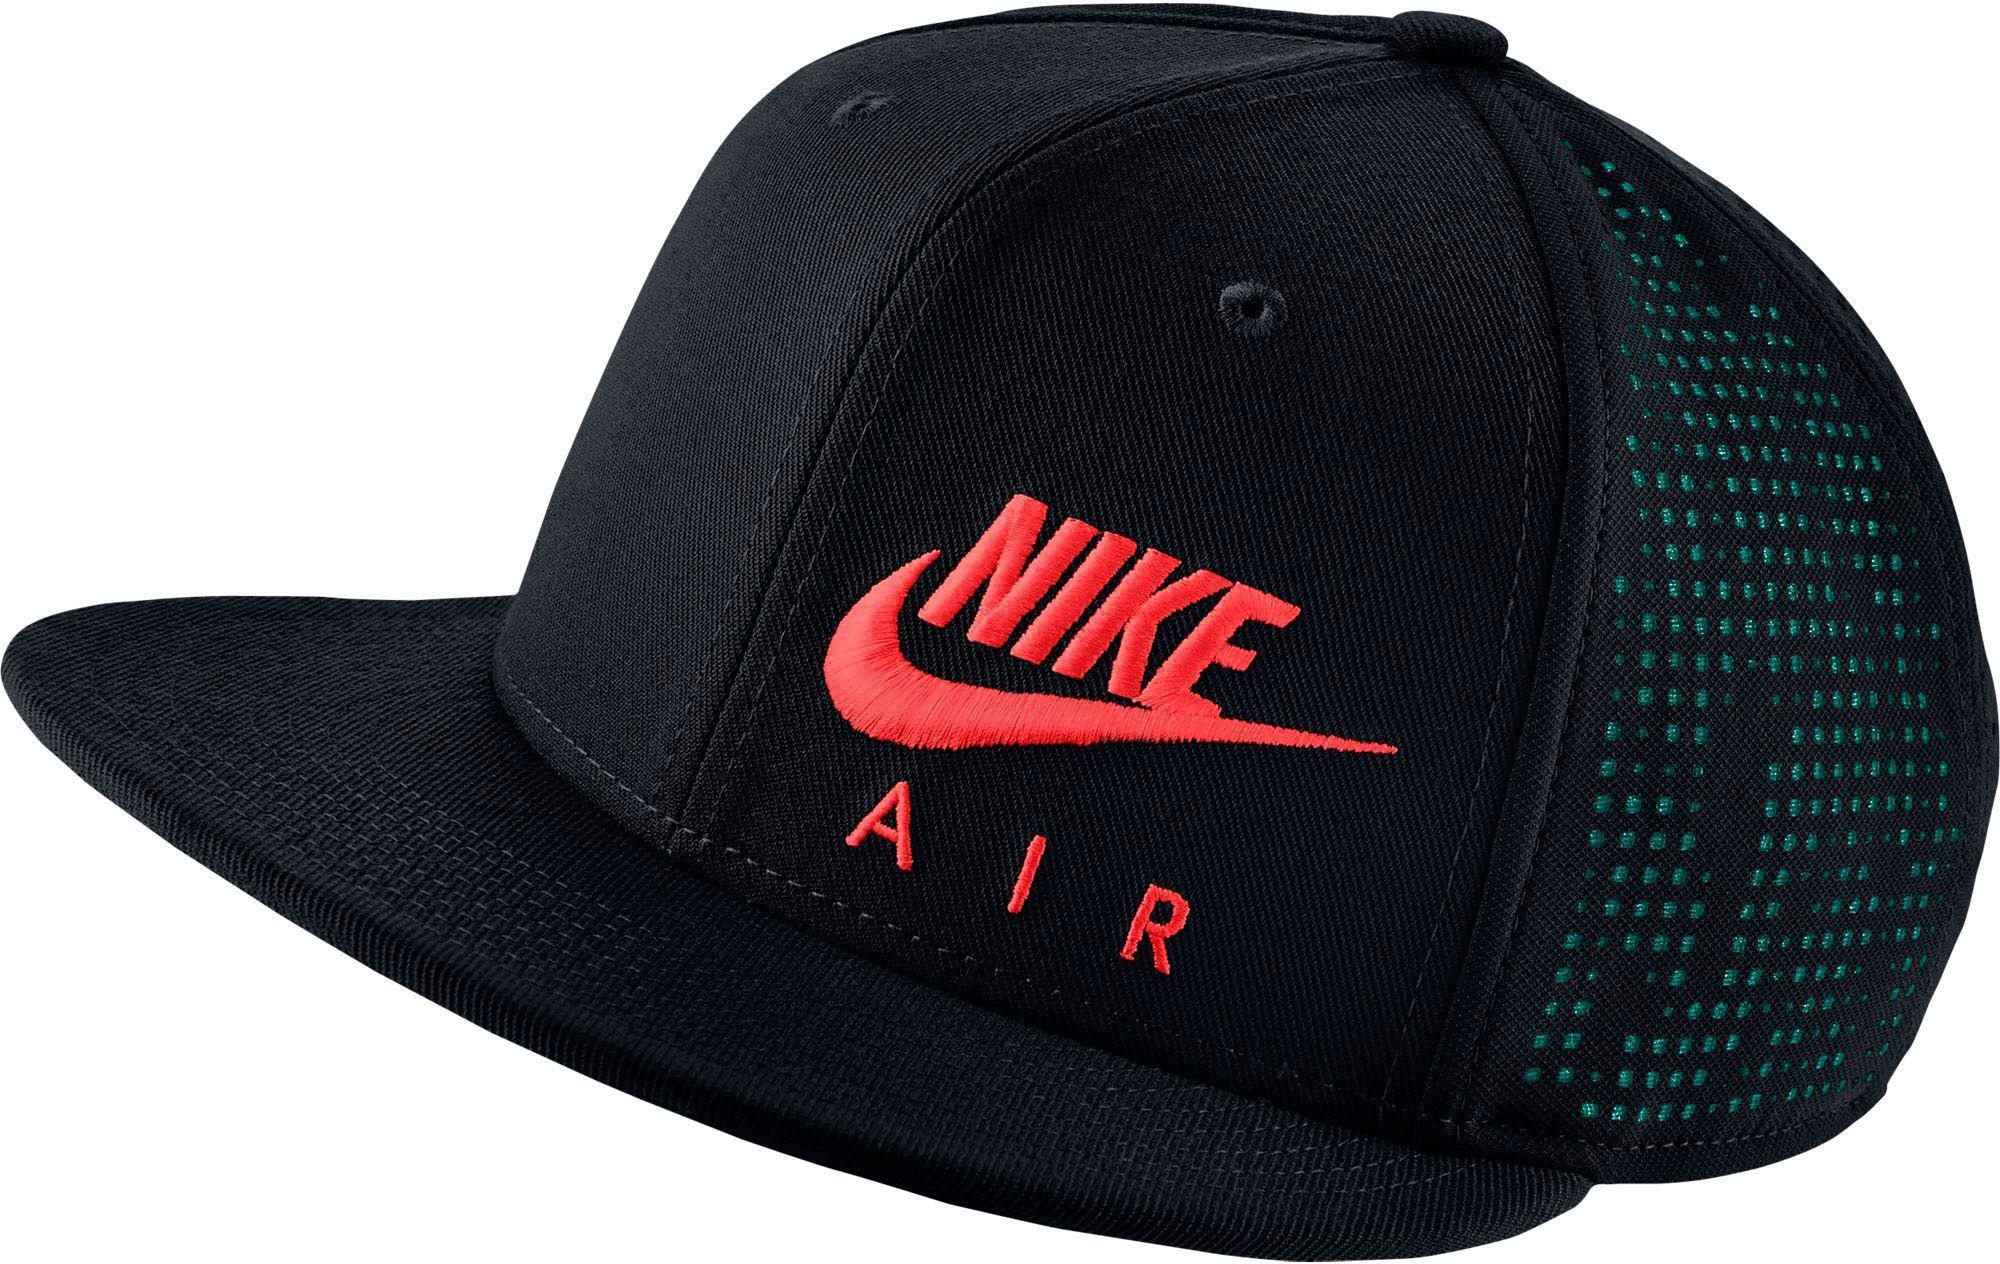 c6e21fbd Nike Air Hybrid True Adjustable Snapback Hat in Black for Men - Lyst